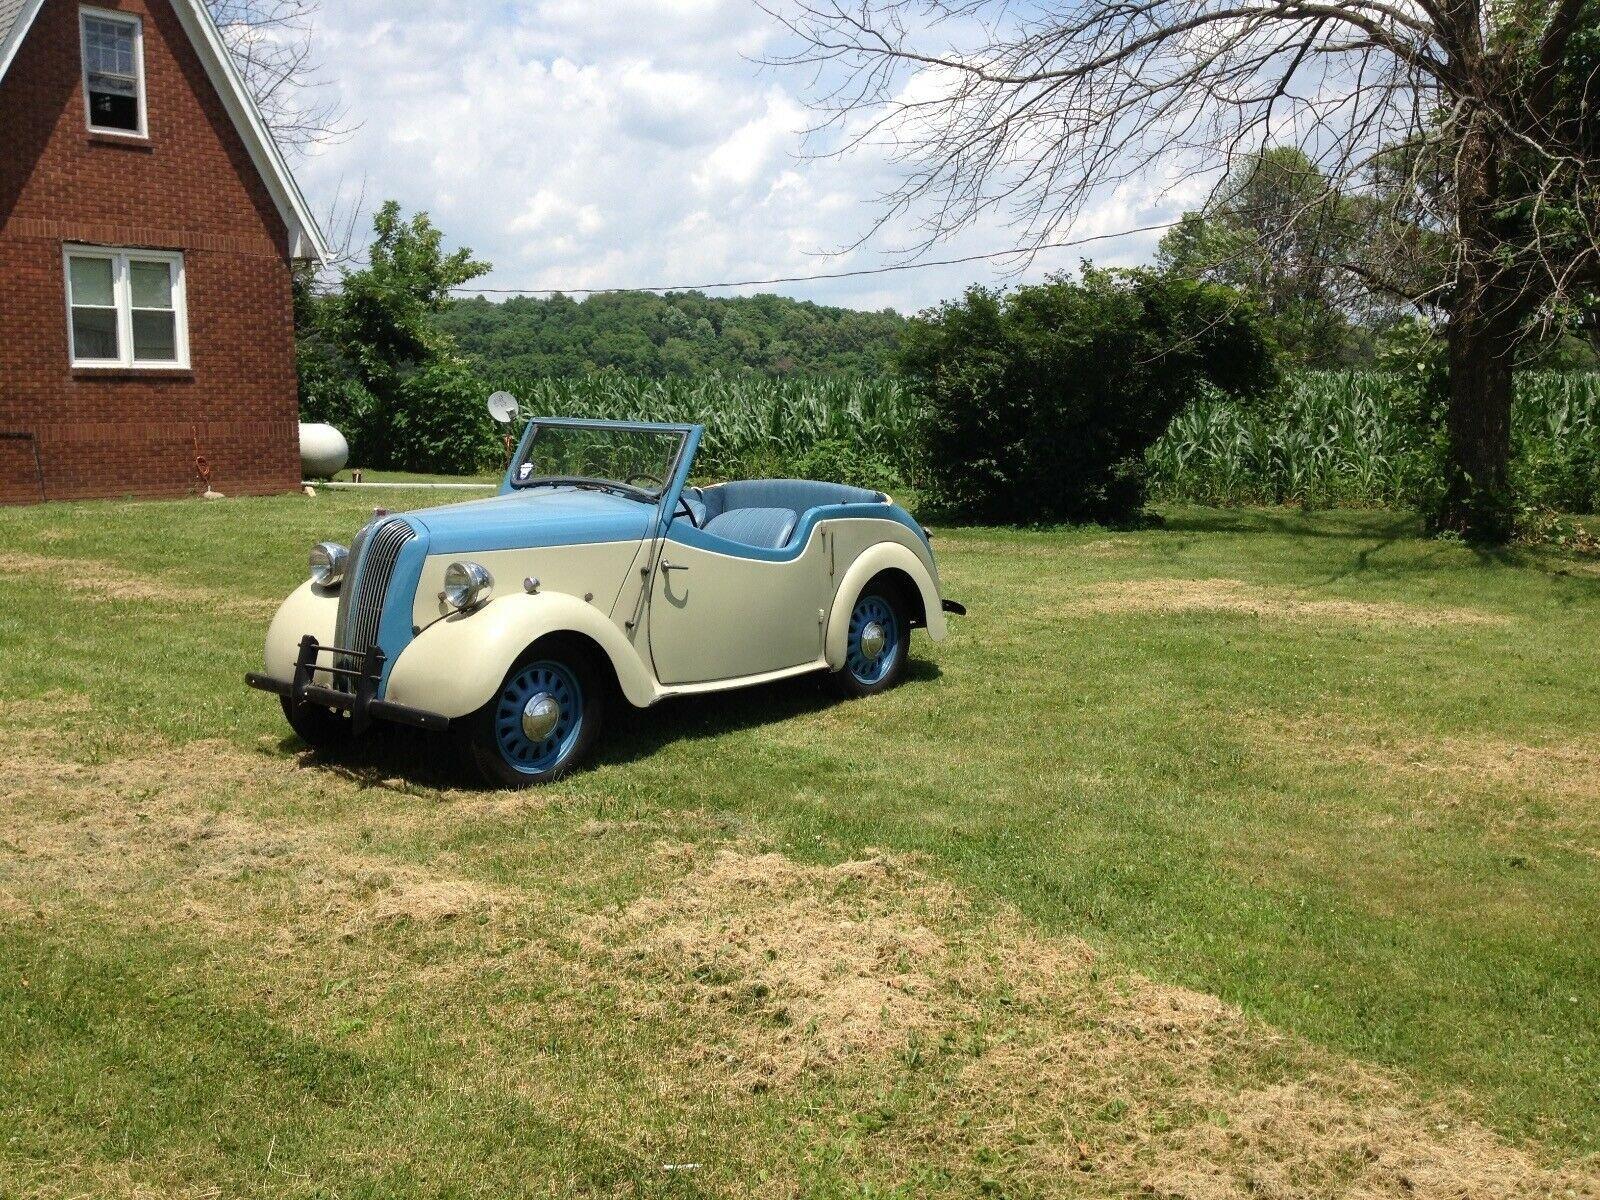 1947 Triumph Standard Convertible